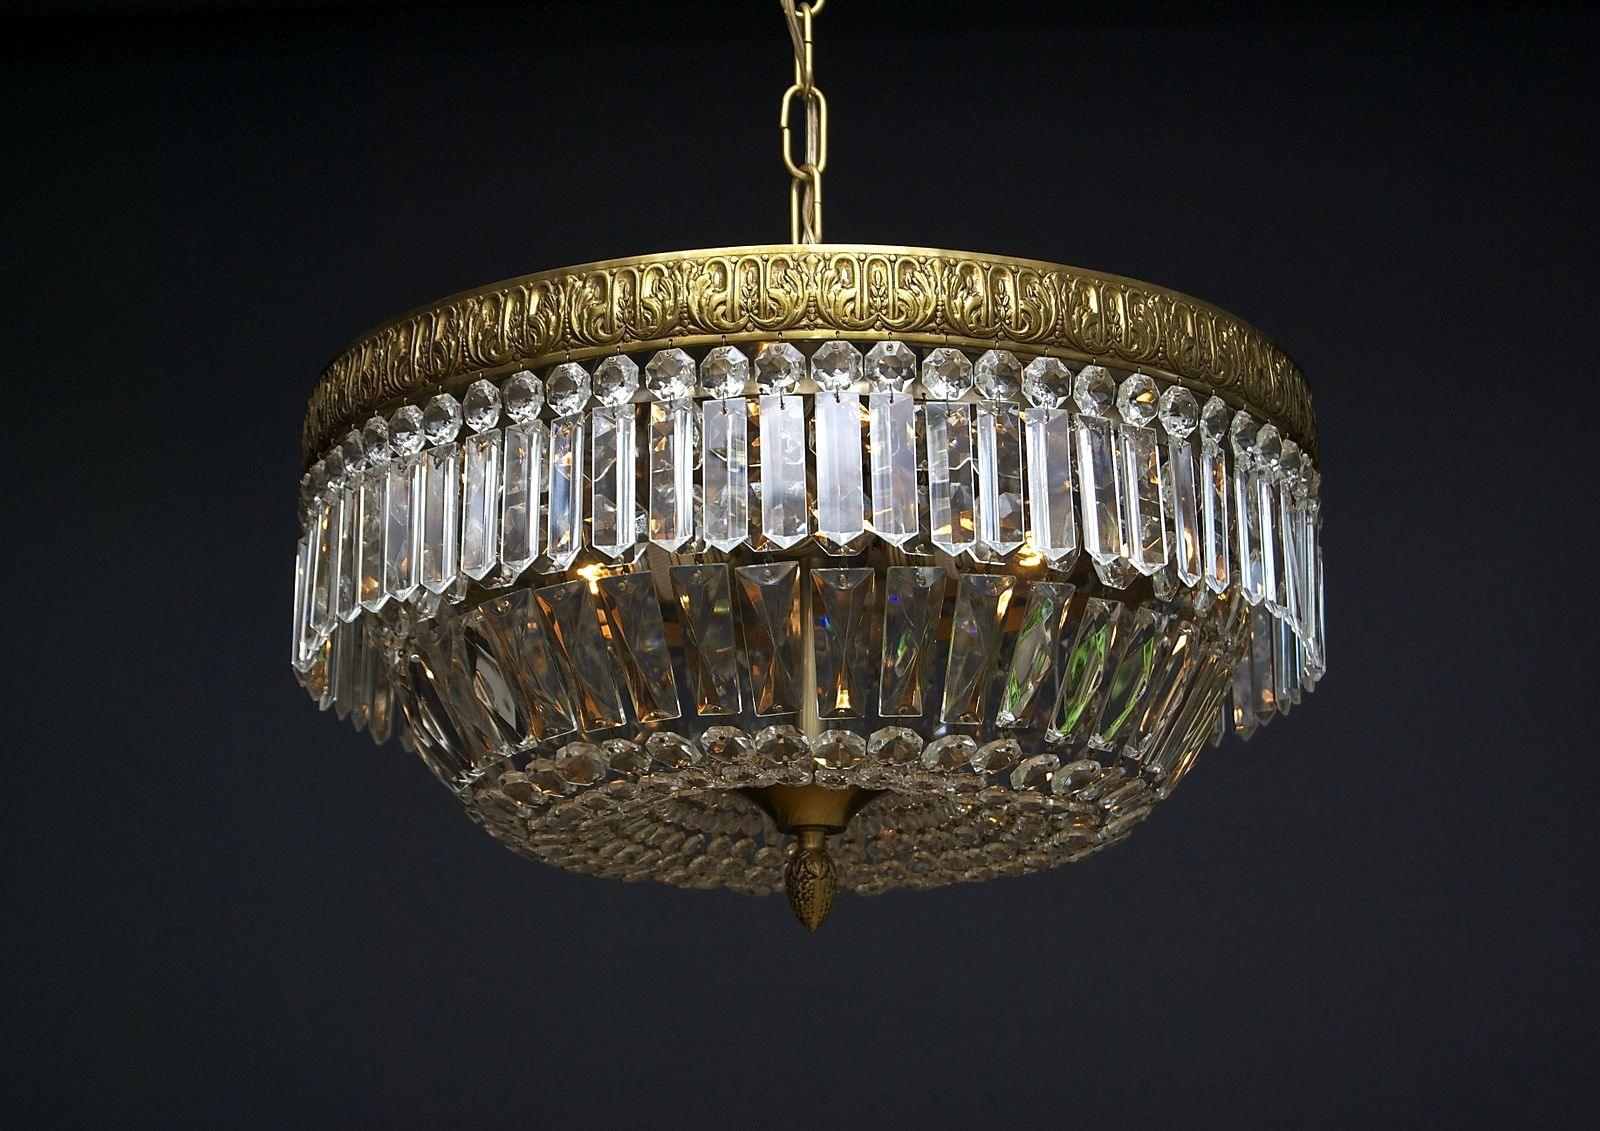 Kristallen Plafonniere : Grote kristallen plafonnière met lichtpunten lamps